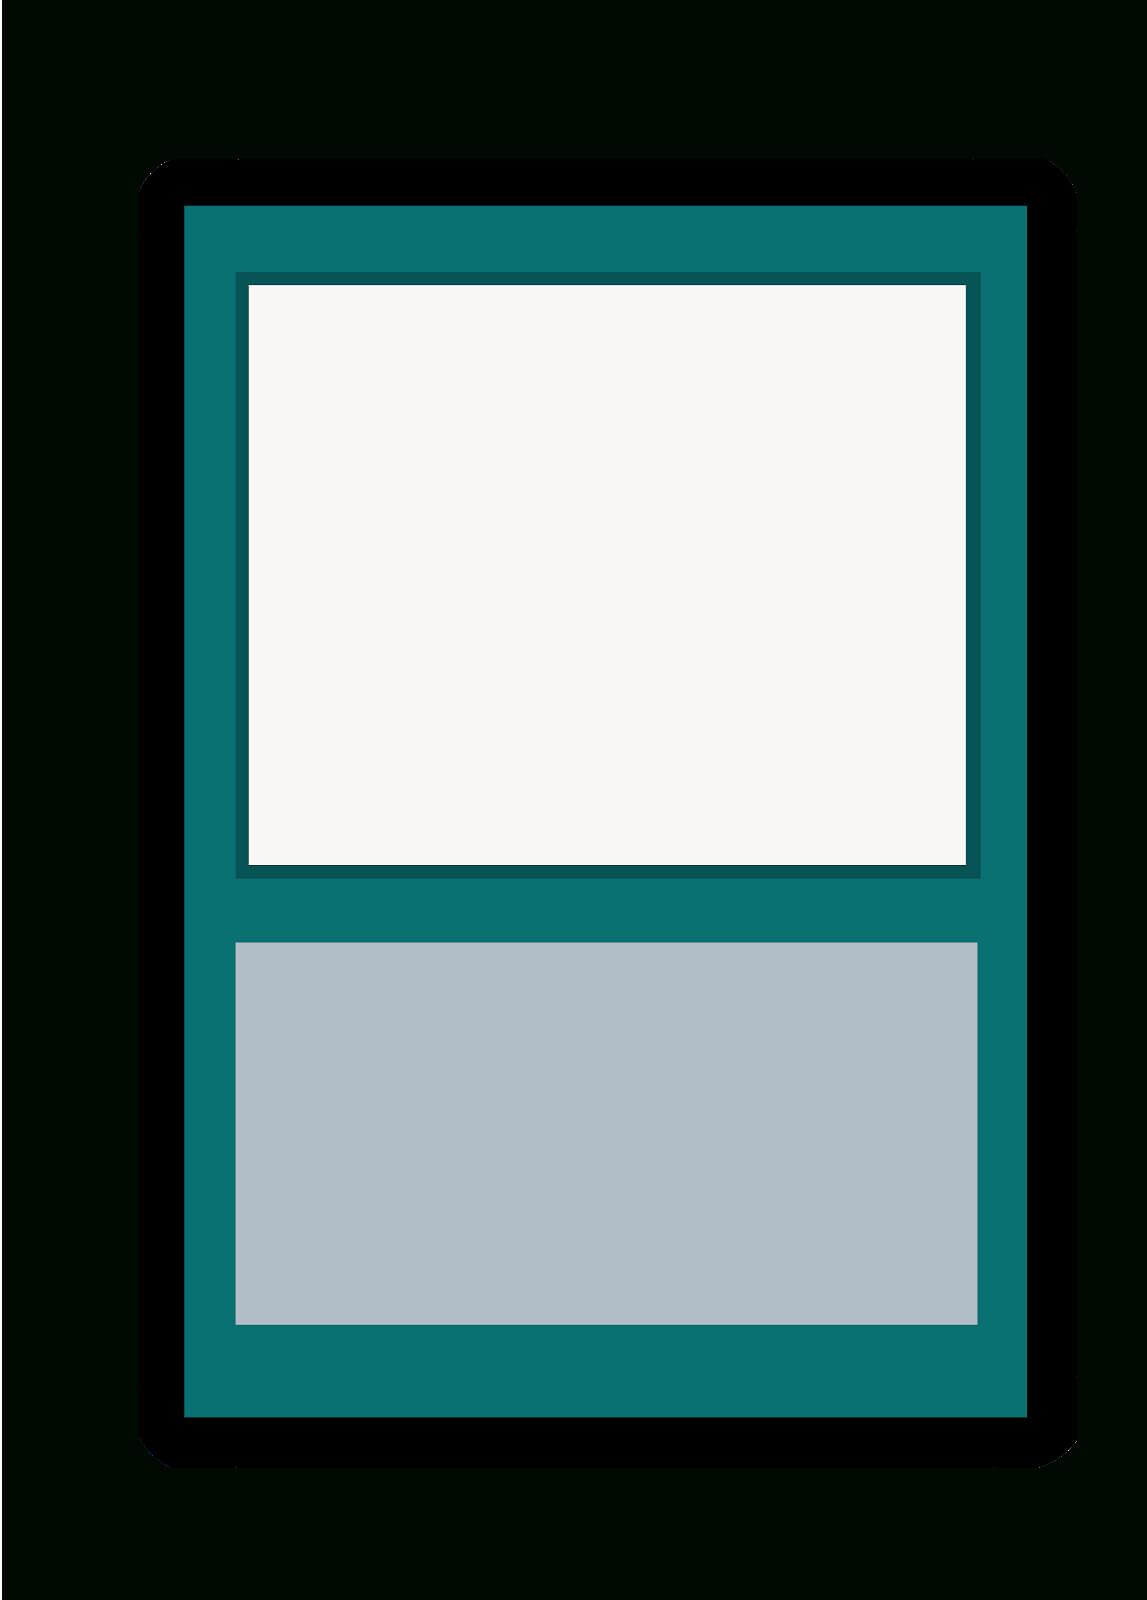 8.bit.love.child: Blank Magic: The Gathering Card Template Throughout Magic The Gathering Card Template